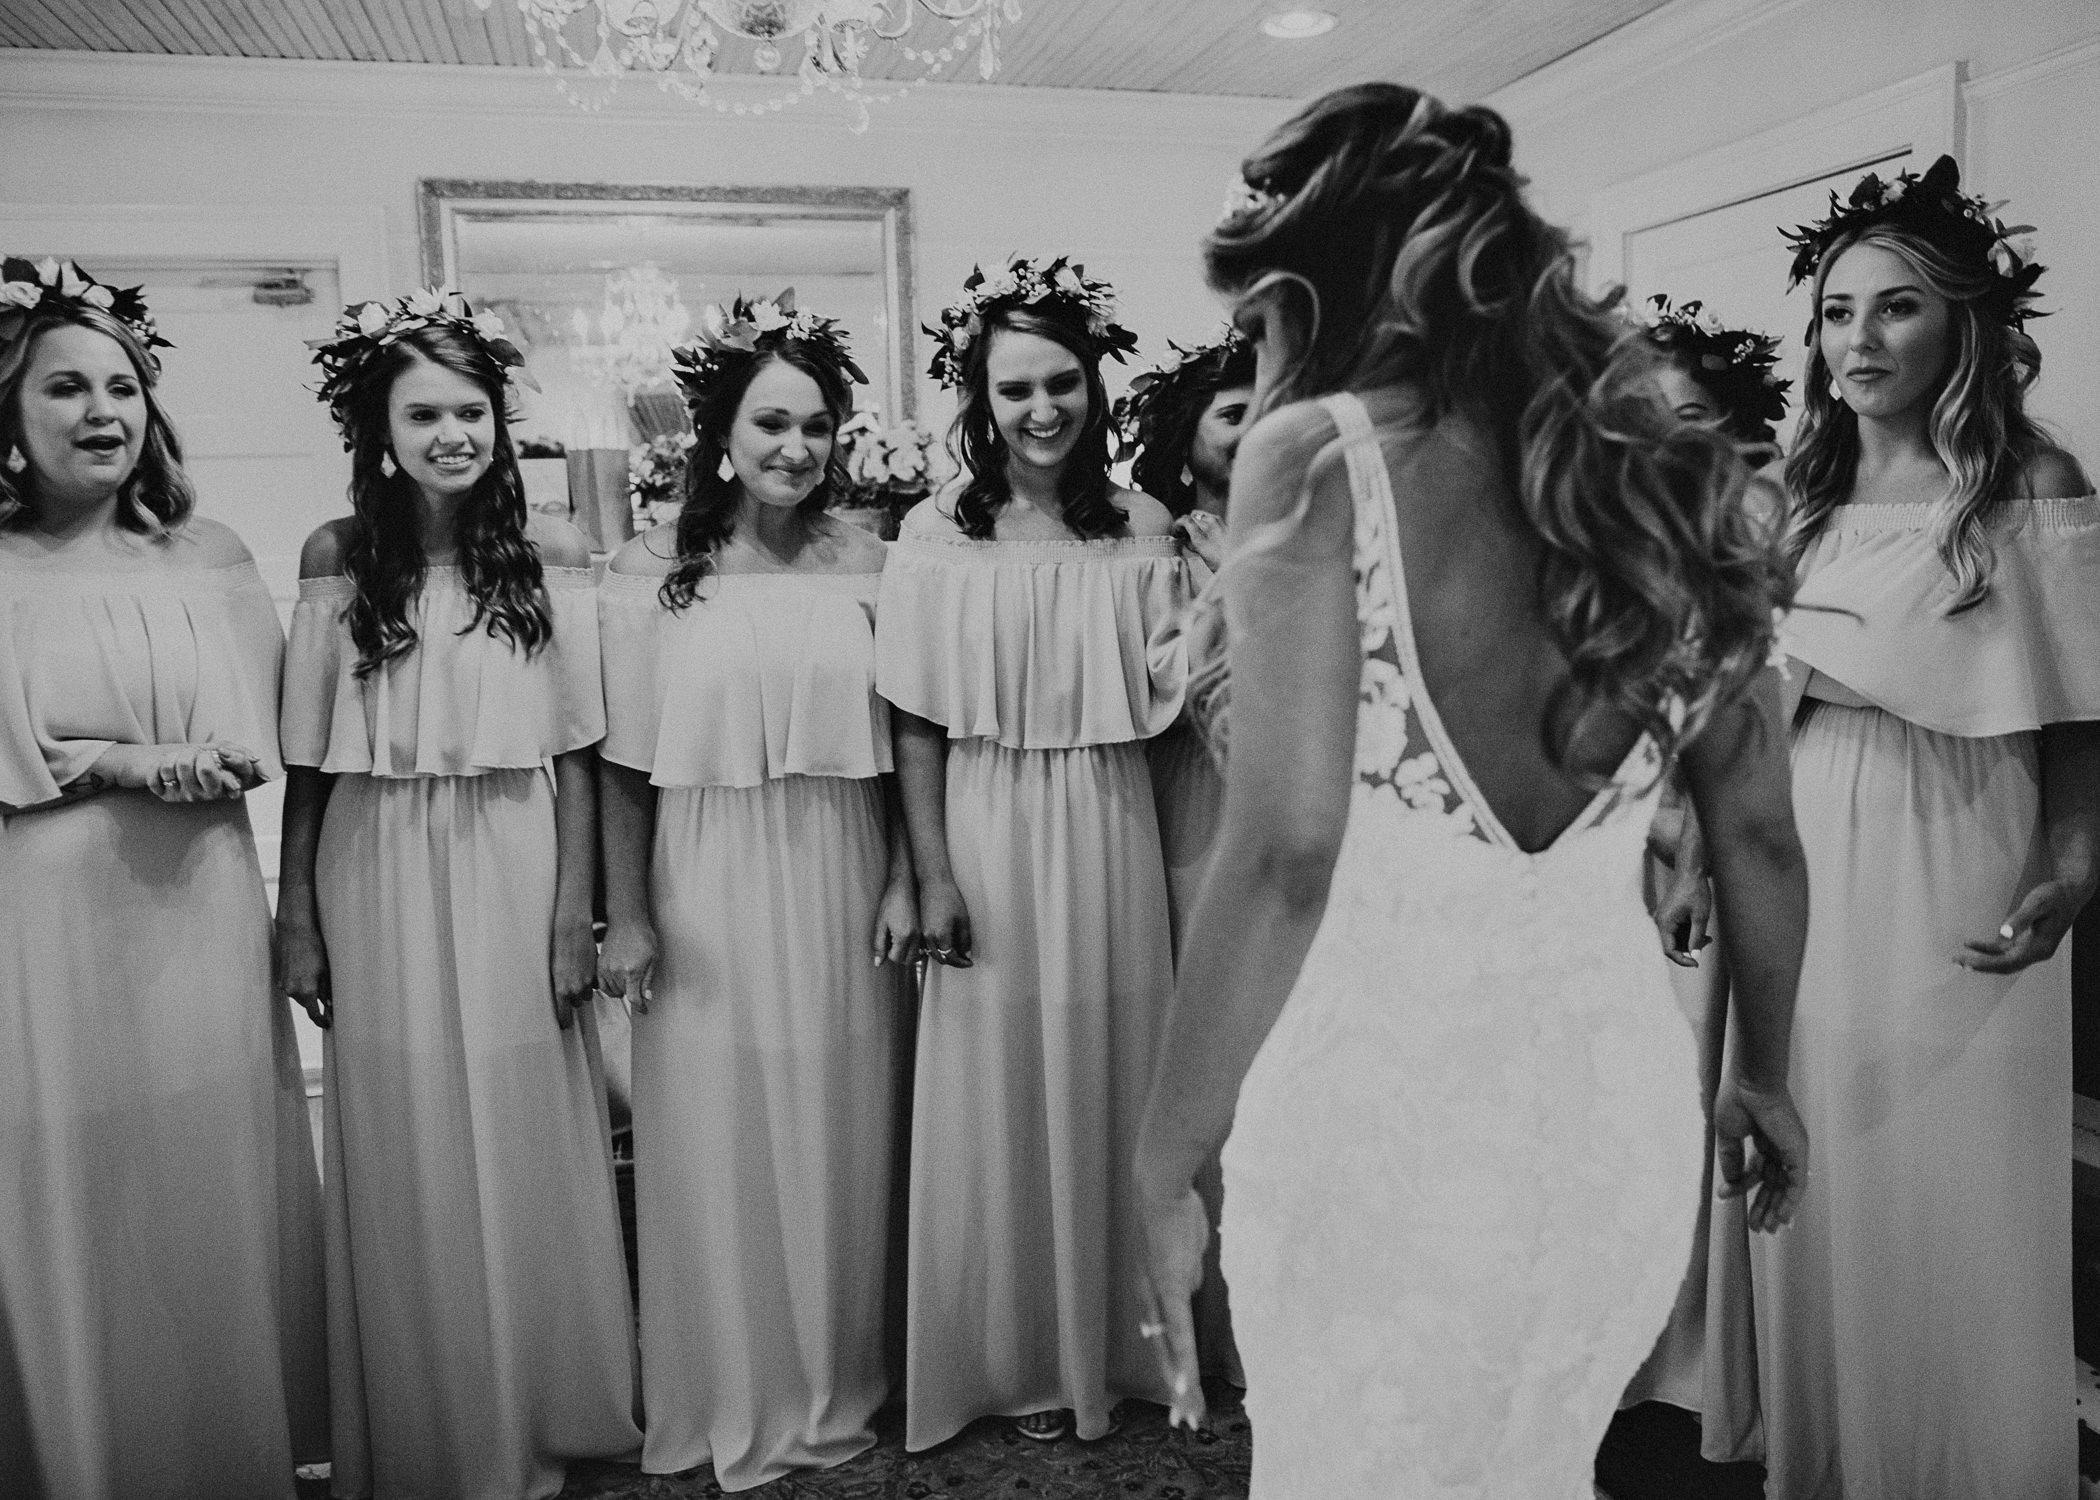 21Carl House Wedding Venue Ga, Atlanta Wedding Photographer - Boho, Bohemian, Junebug Weddings, Vintage, Retro, Trendy. Aline Marin Photography. .jpg